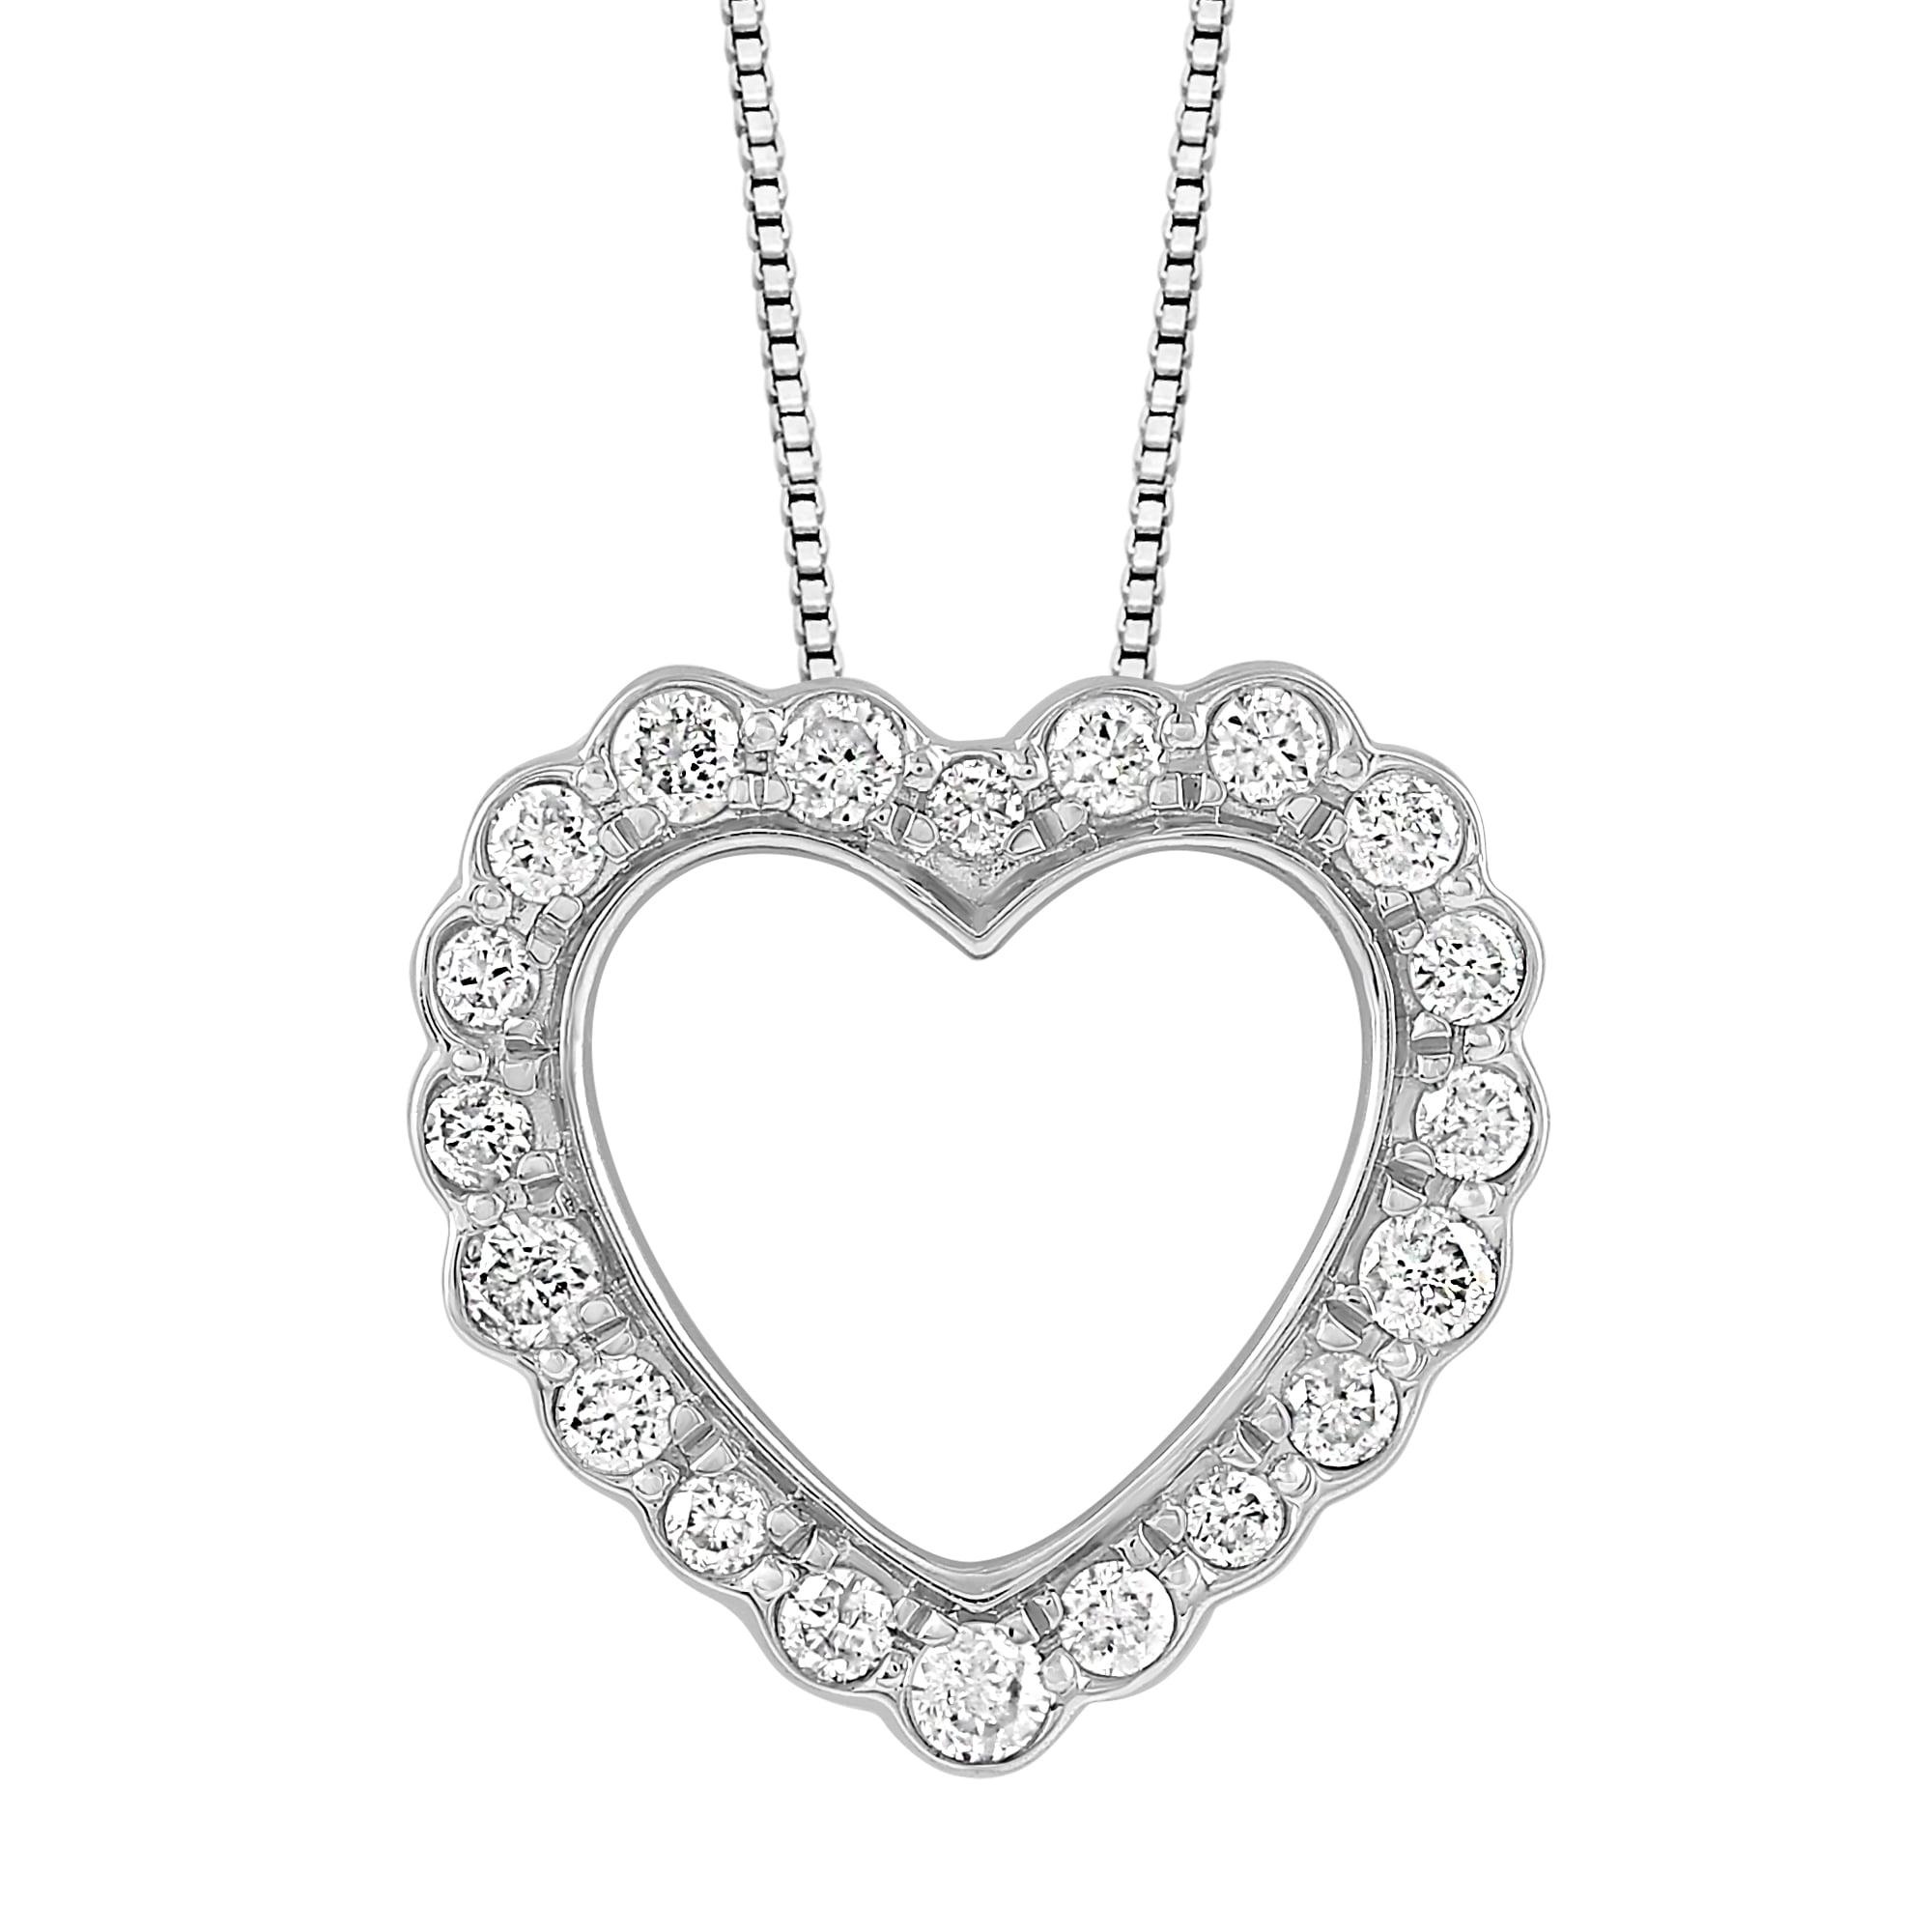 1//10 cttw KATARINA Cognac Diamond Cross Pendant Necklace in Sterling Silver